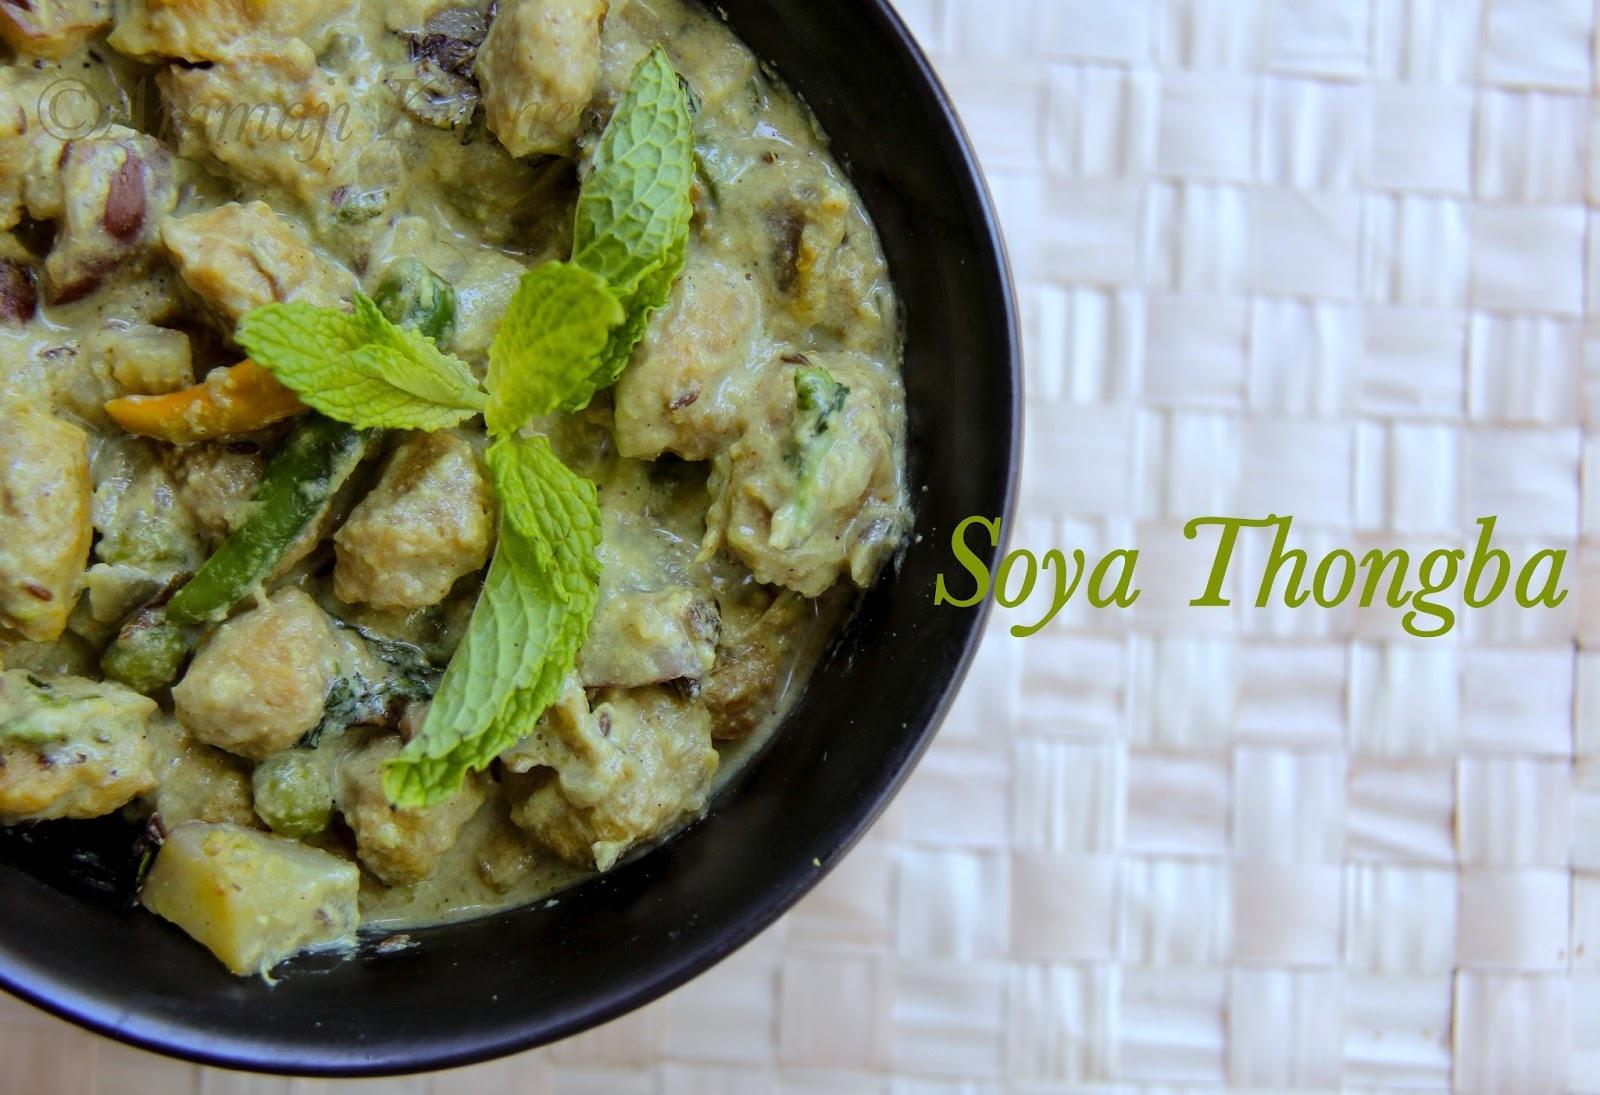 Soya Thongba - A Manipuri Dish